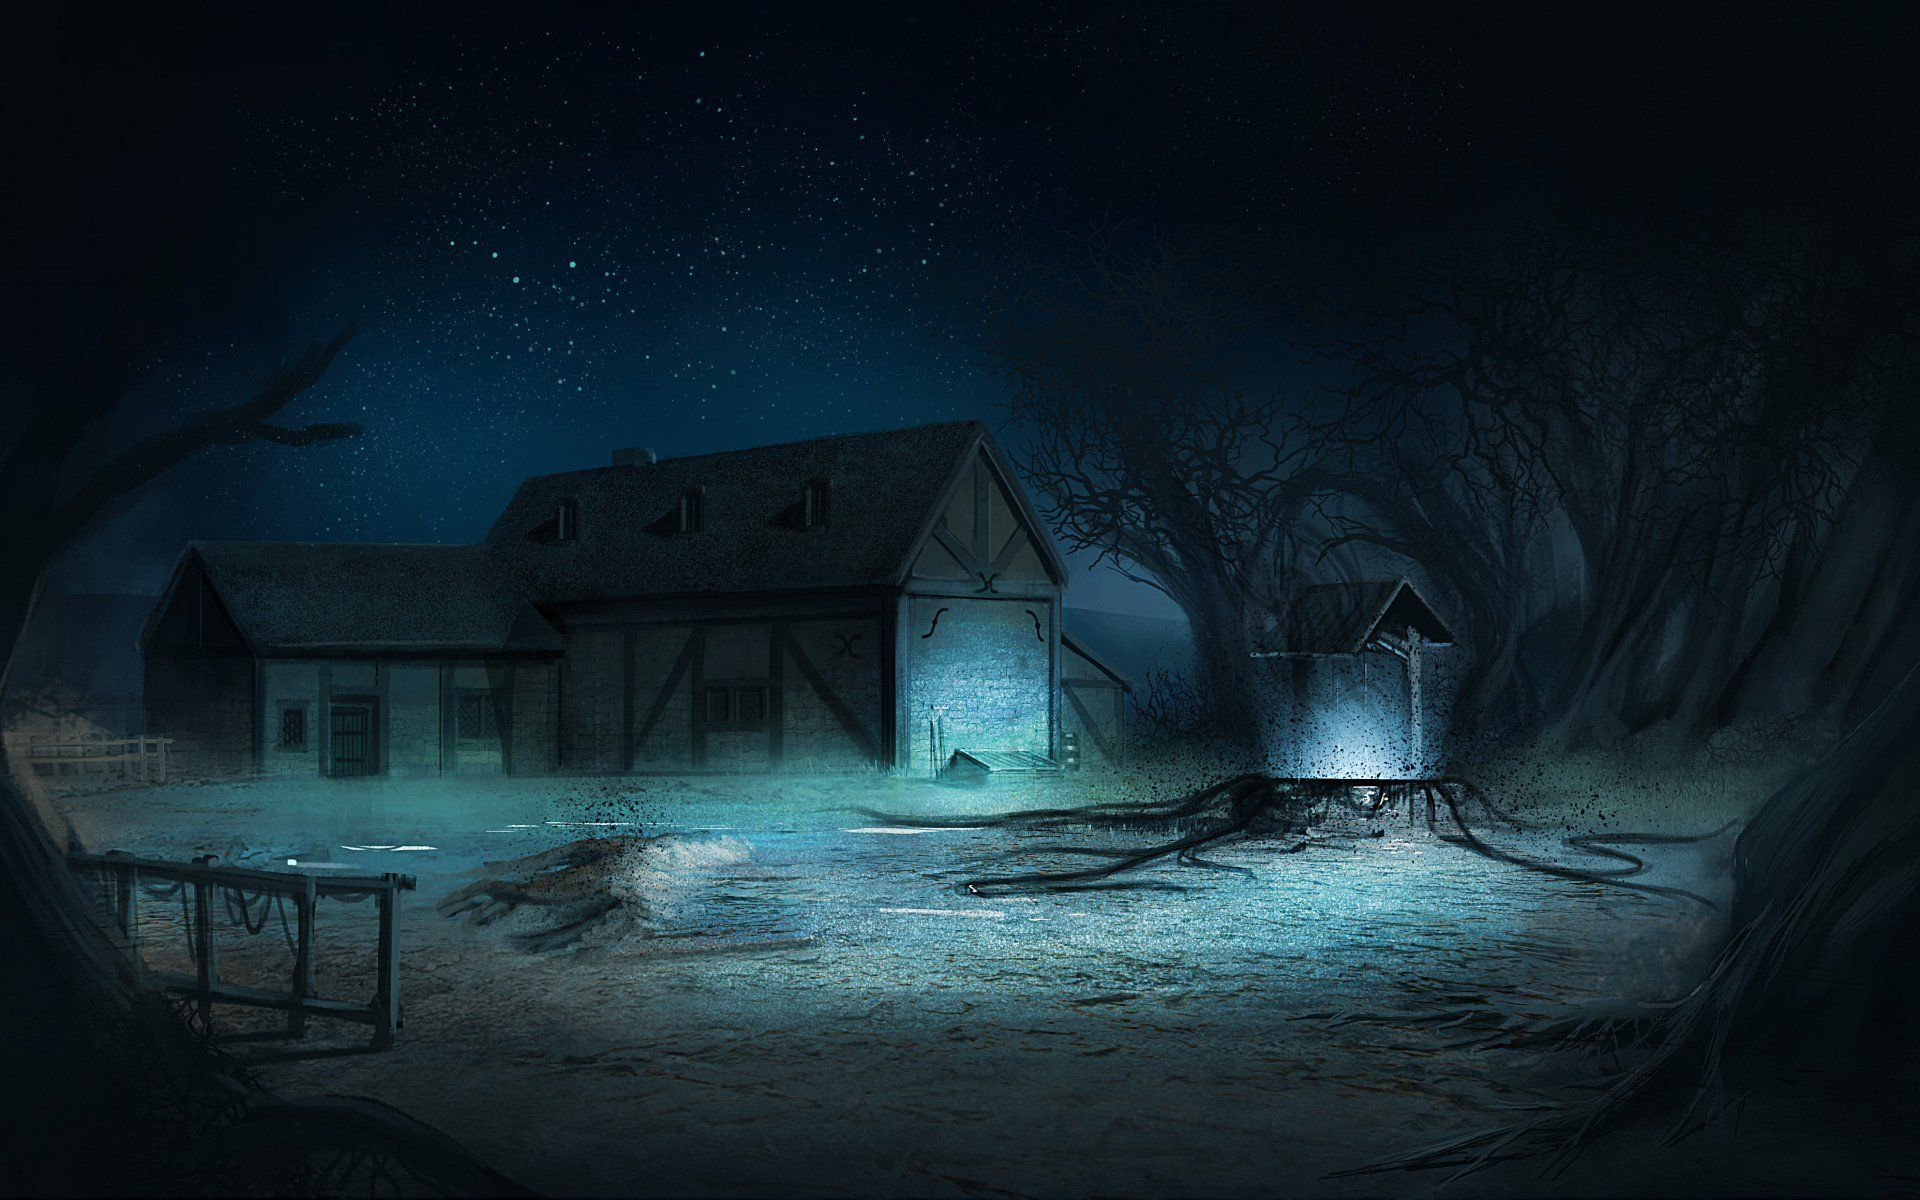 Art Night Village, Forest House At Night, Gloomy wallpaper